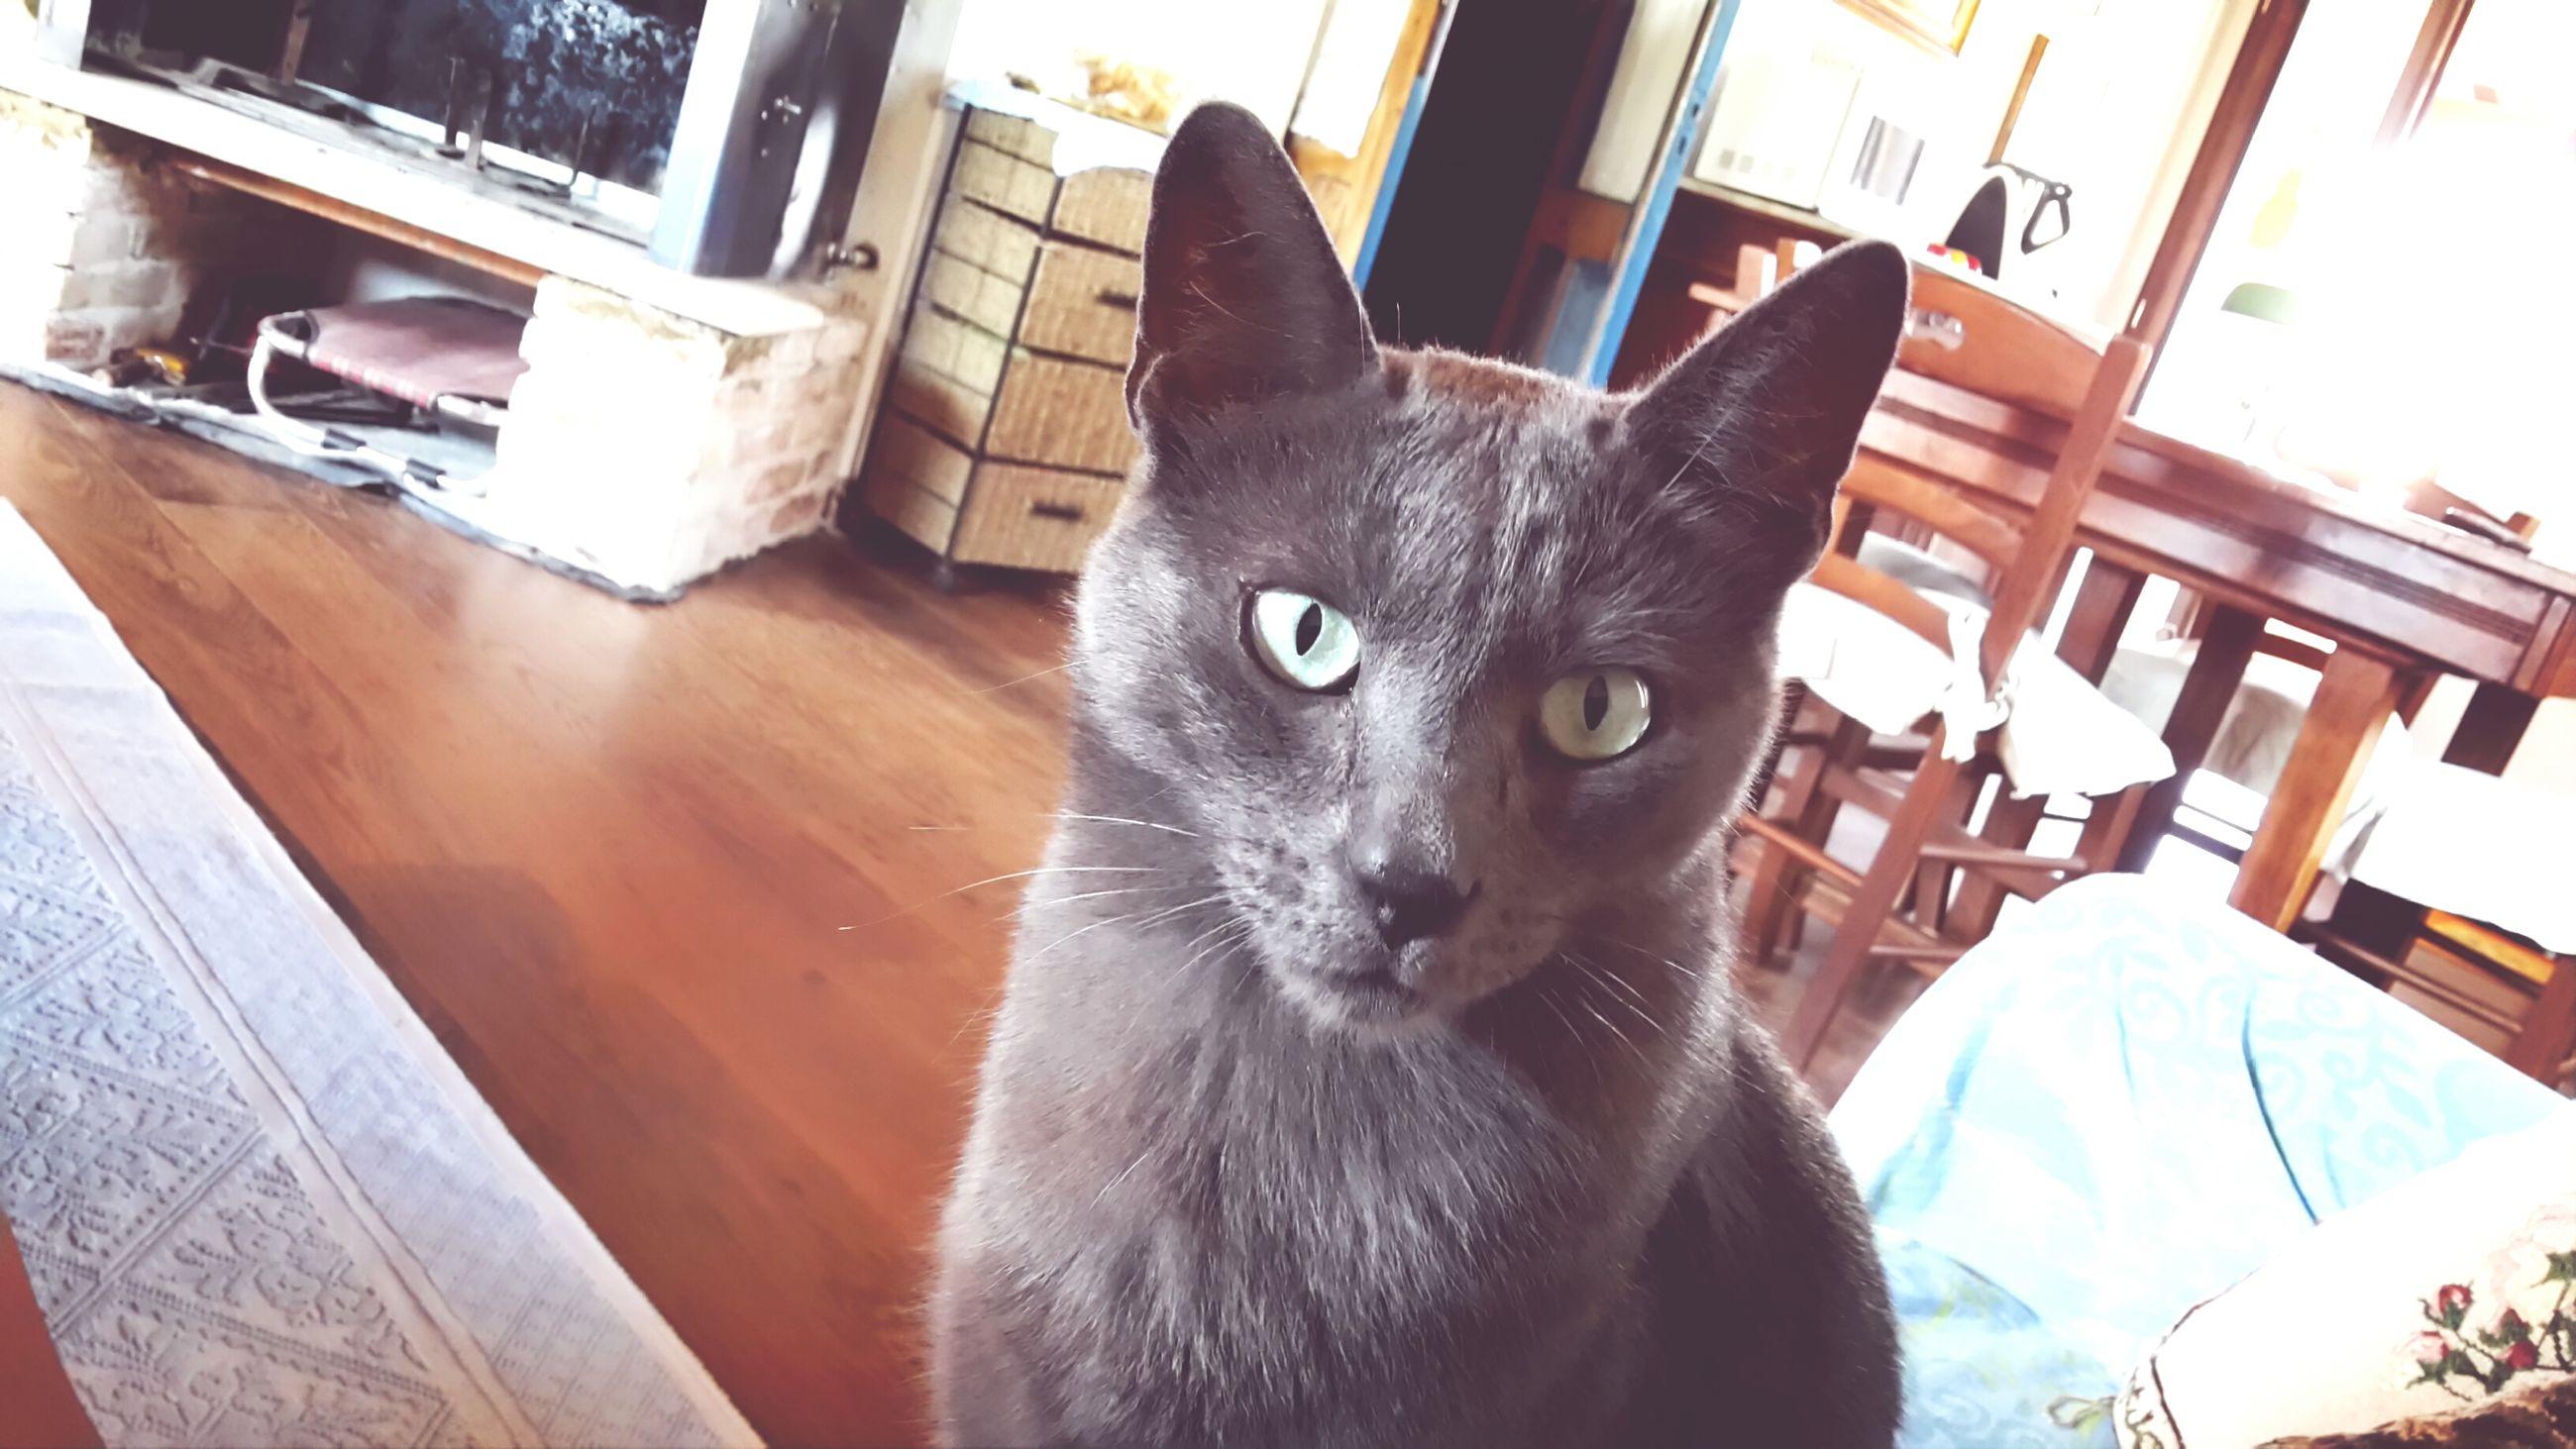 domestic cat, cat, pets, one animal, domestic animals, animal themes, feline, mammal, whisker, portrait, looking at camera, indoors, close-up, sitting, alertness, animal head, staring, home interior, animal eye